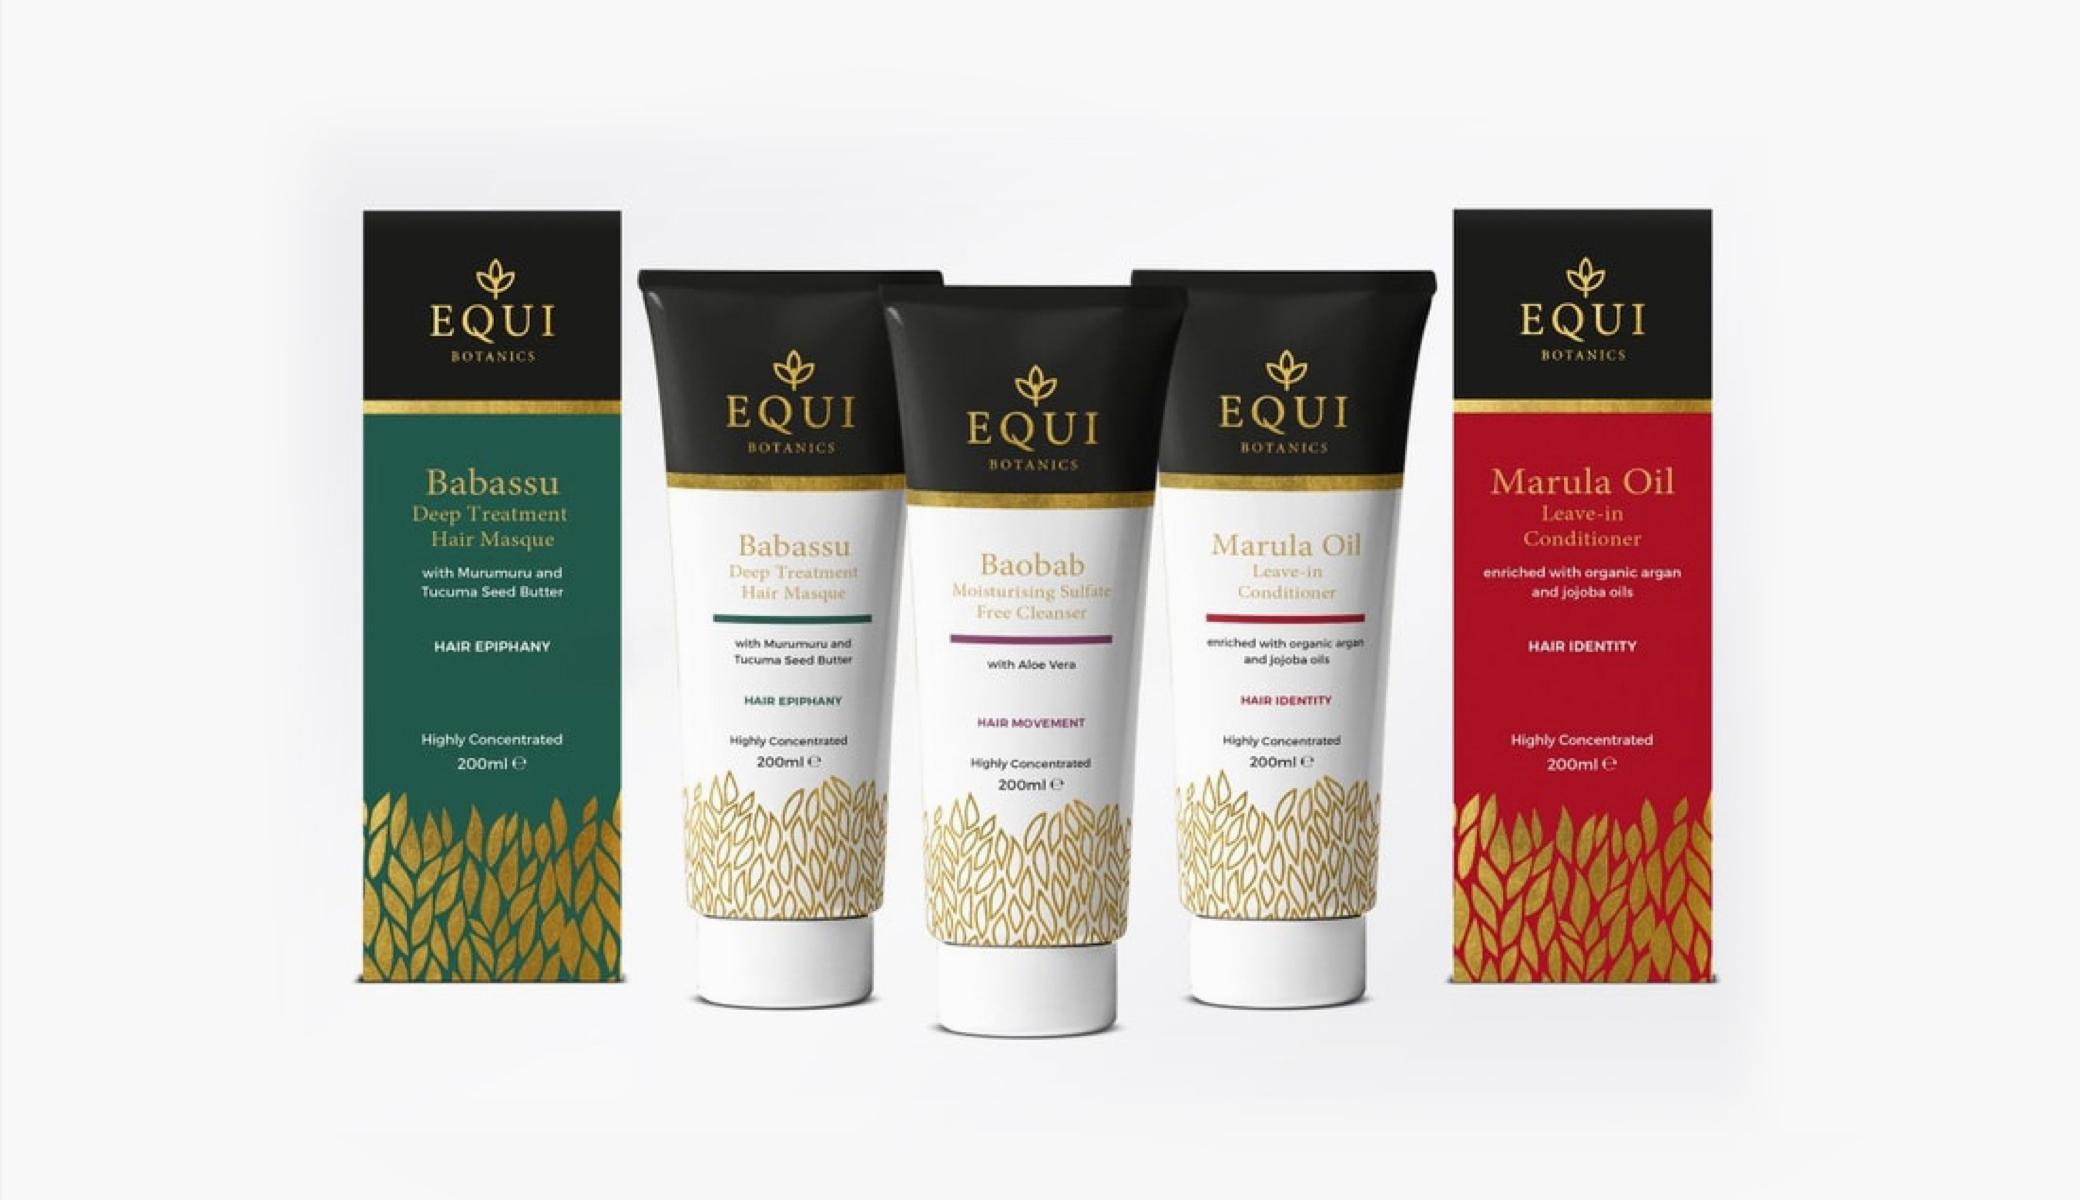 EQUI Botanics Branding